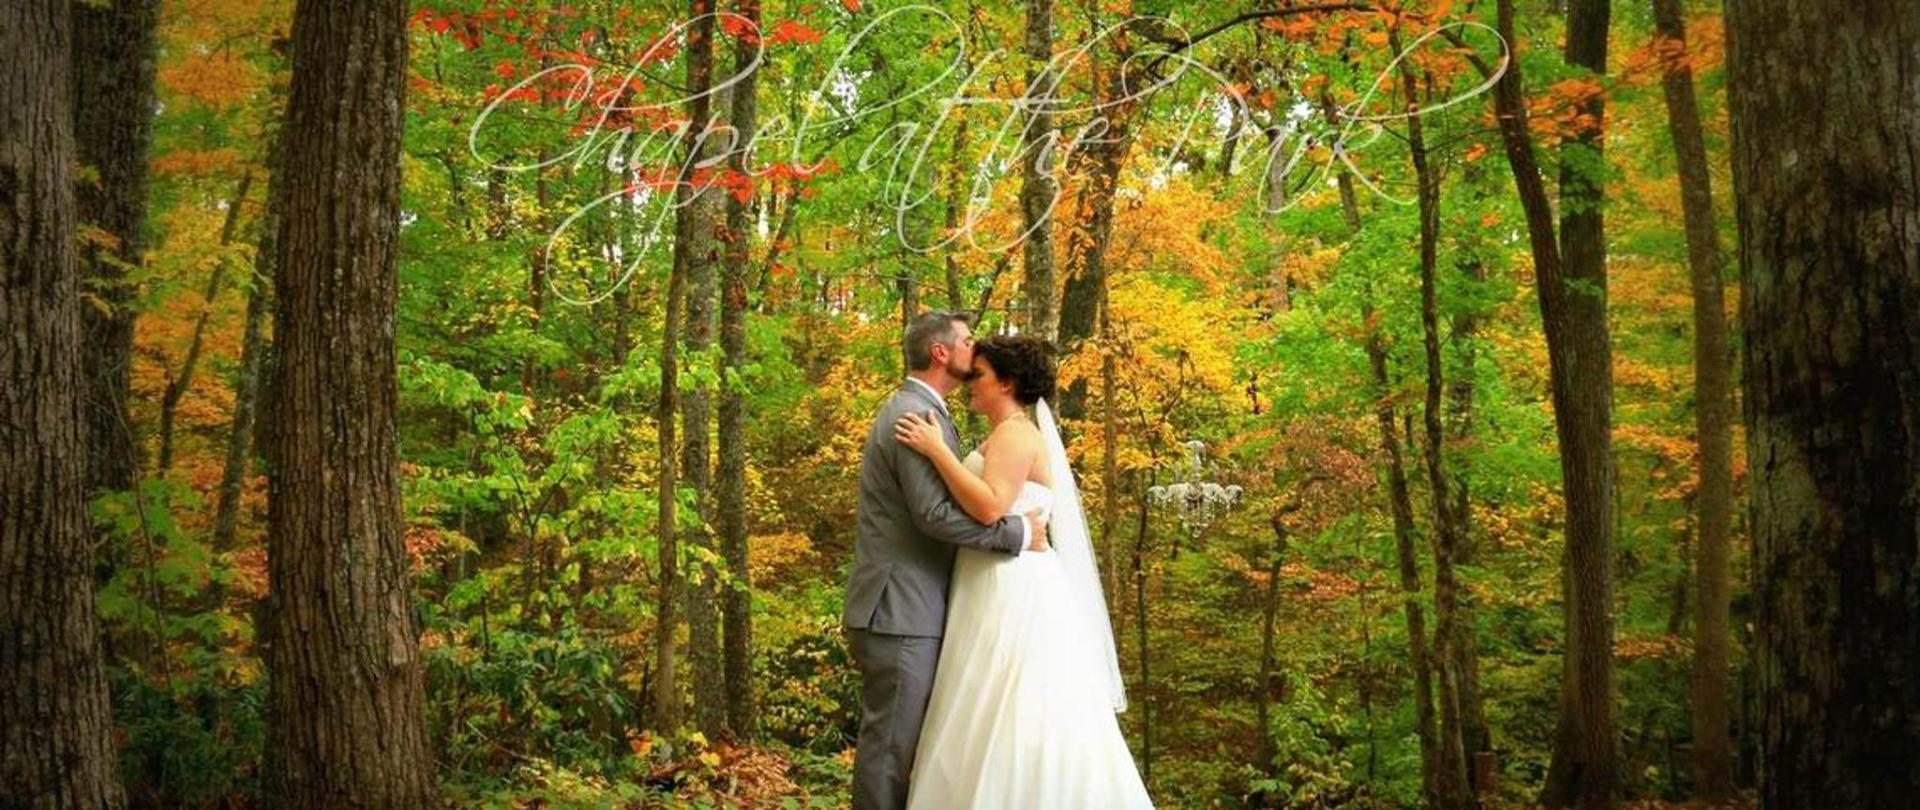 chapel-at-the-park-fall-forest-kiss.jpg.1140x481_default.jpg